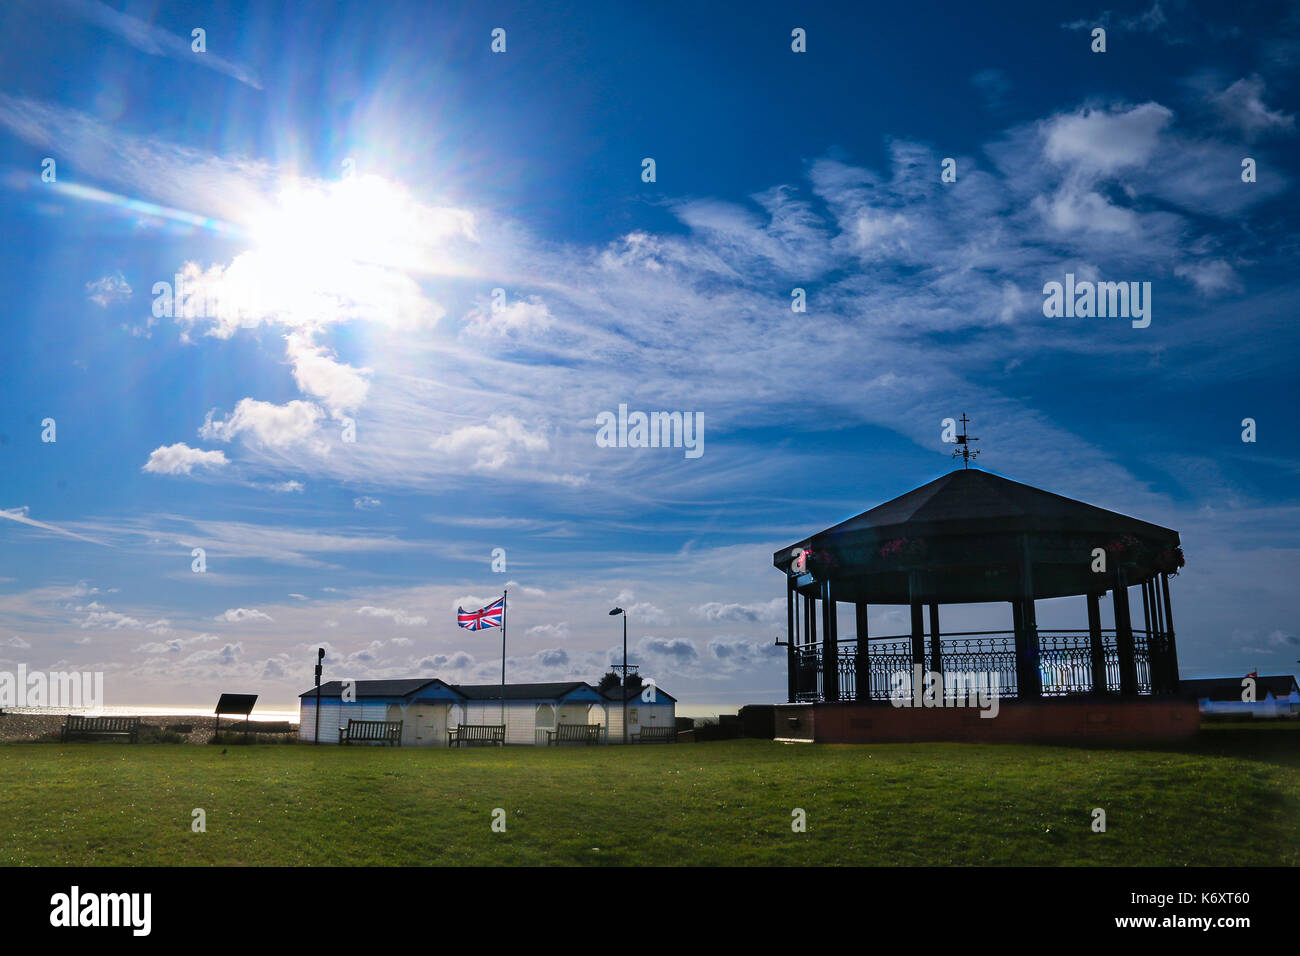 Walmer Memorial Bandstand under a blue sky - Stock Image